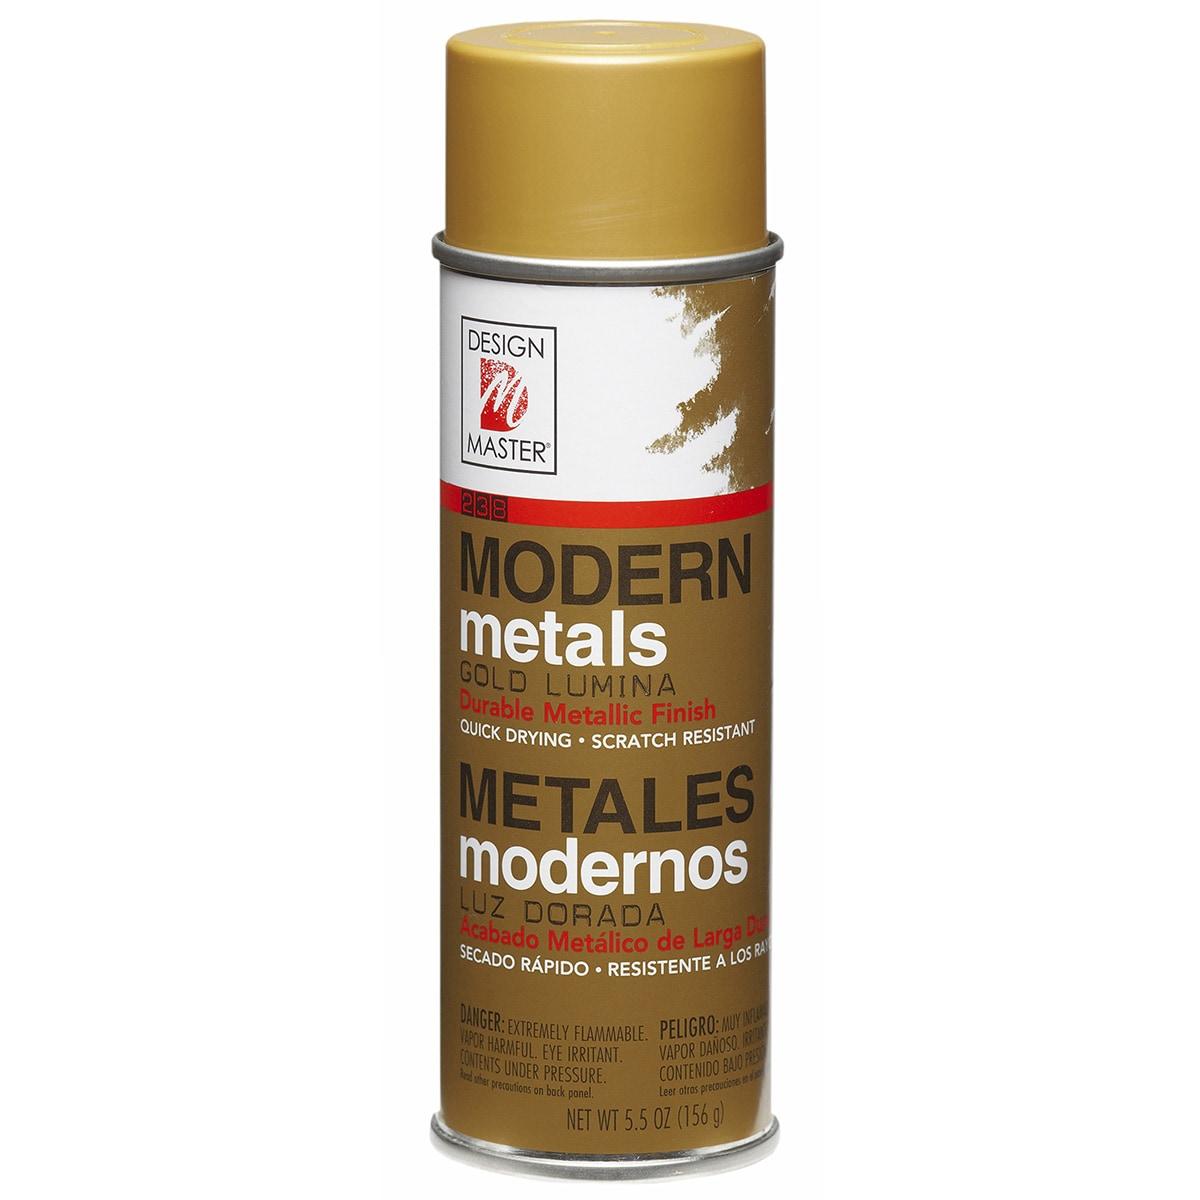 Overstock.com Modern Metals Spray Paint 5.5ozGold Lumina